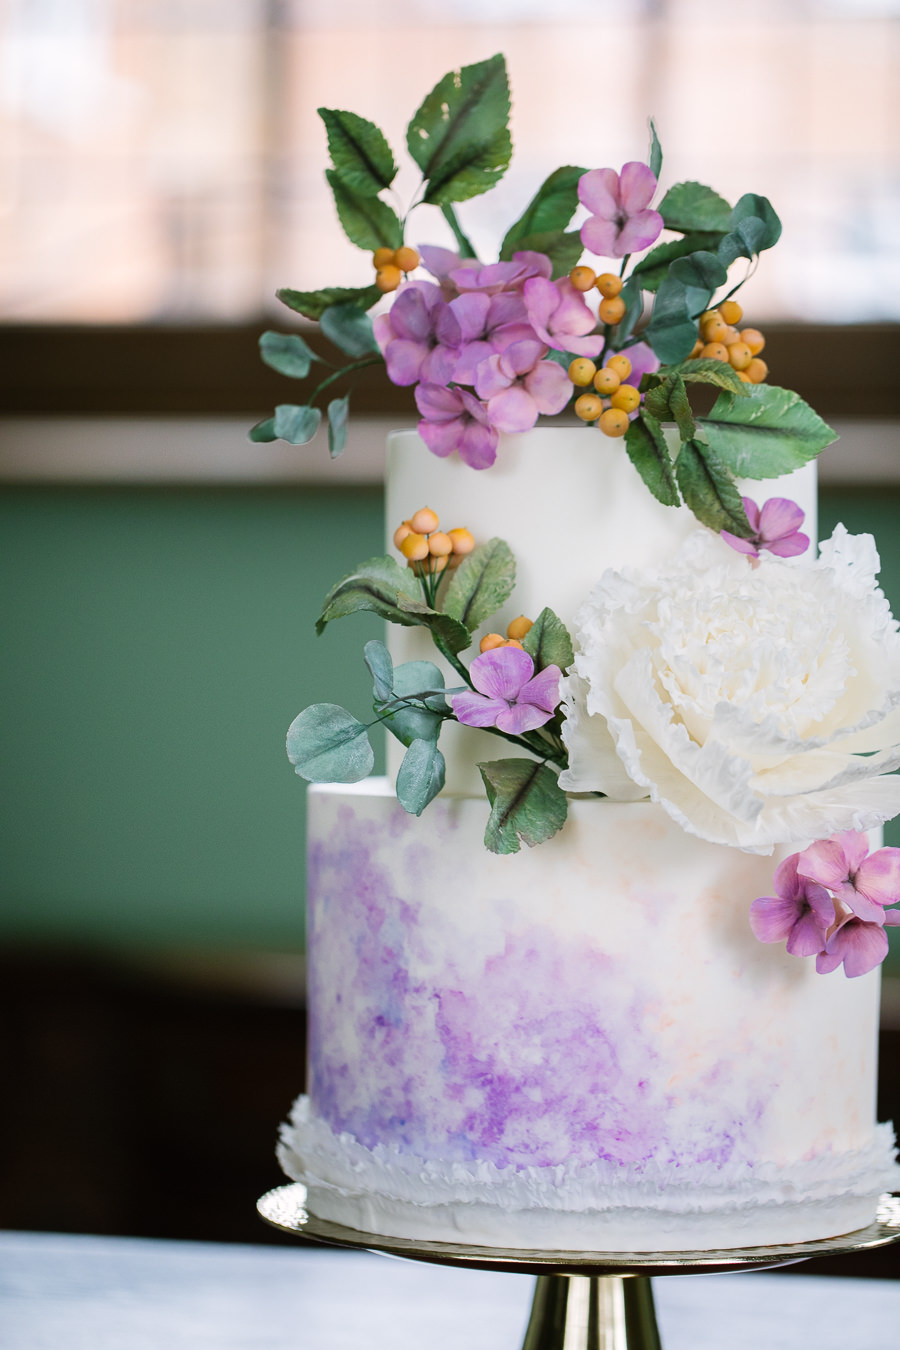 'Understated Elegance' Spring Styled Hampshire Bridal Shoot – Rownhams House, photo credit Nisha Haq Photography (2)